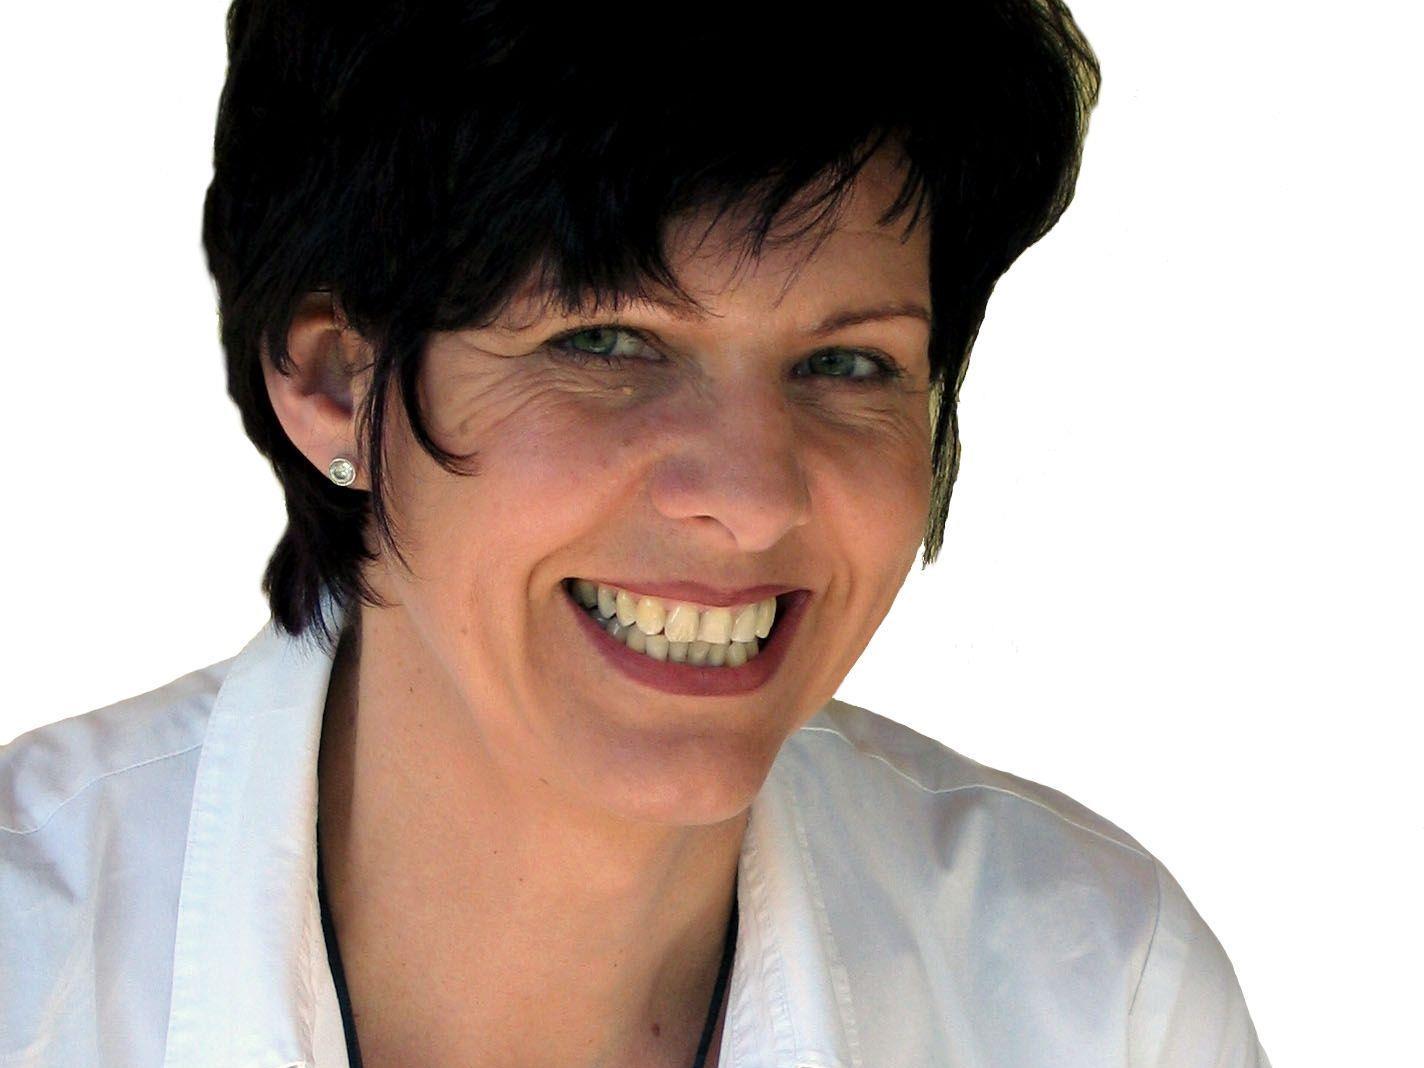 Referentin Edith Viktorin